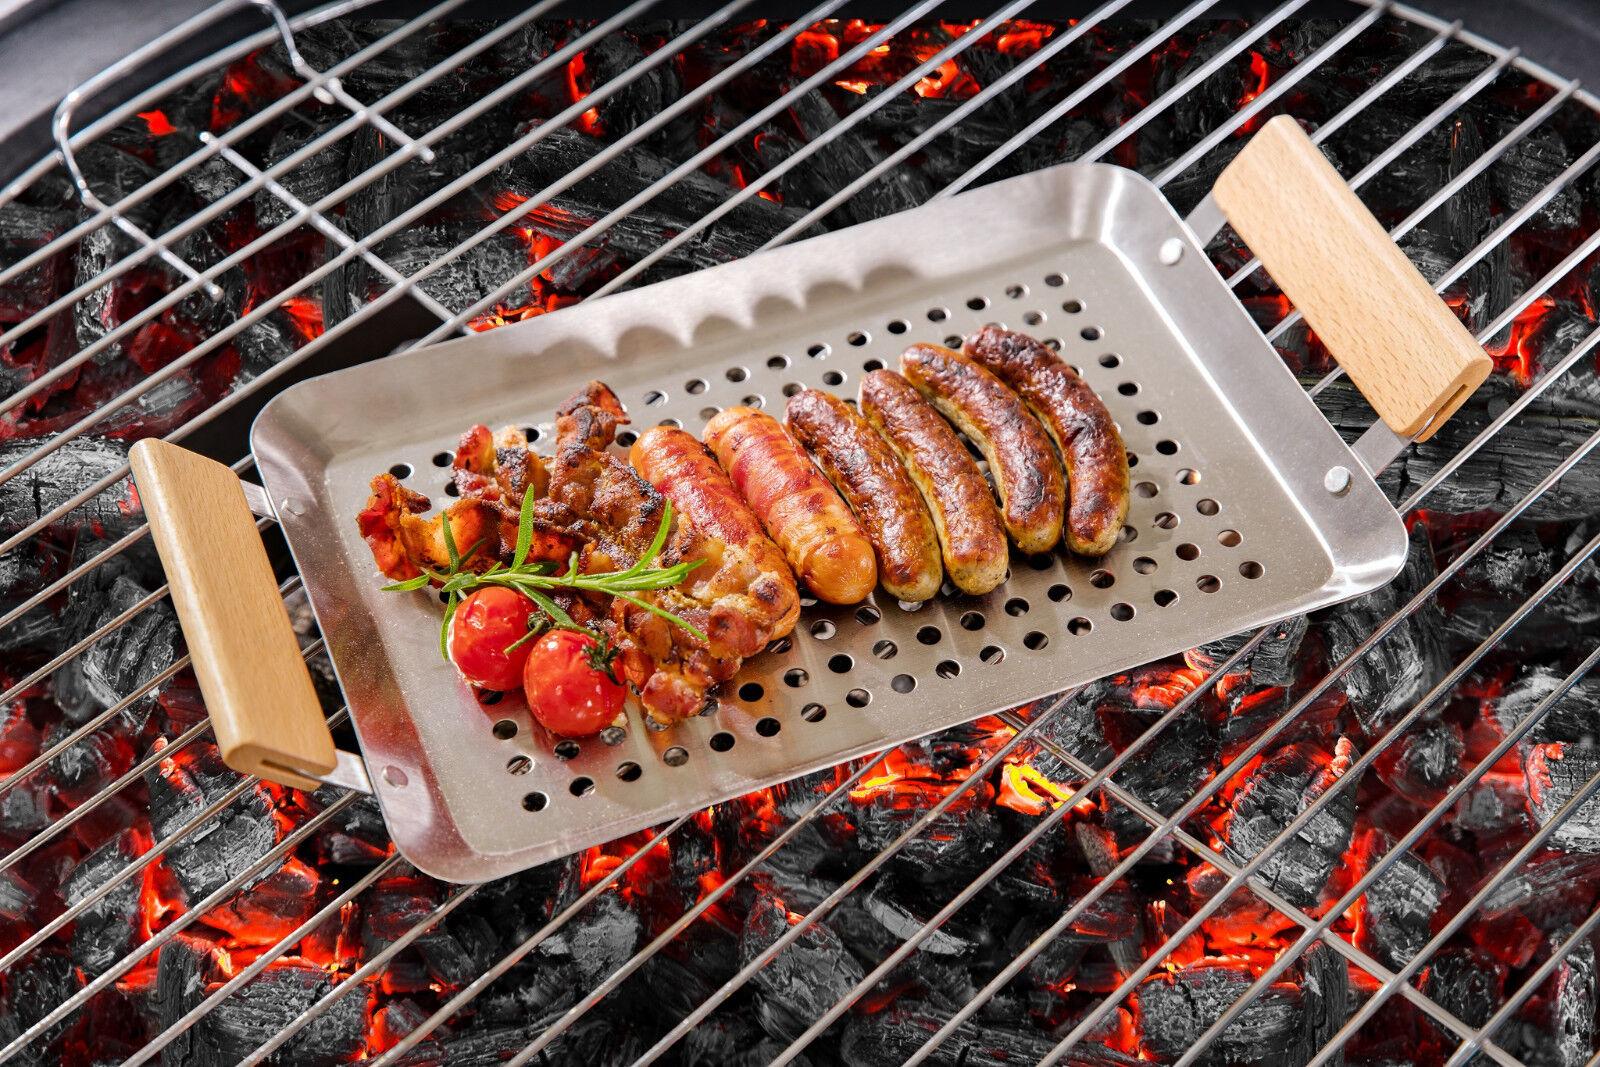 Weber Elektrogrill Günstig Kaufen : Fisch weber grill test vergleich fisch weber grill günstig kaufen